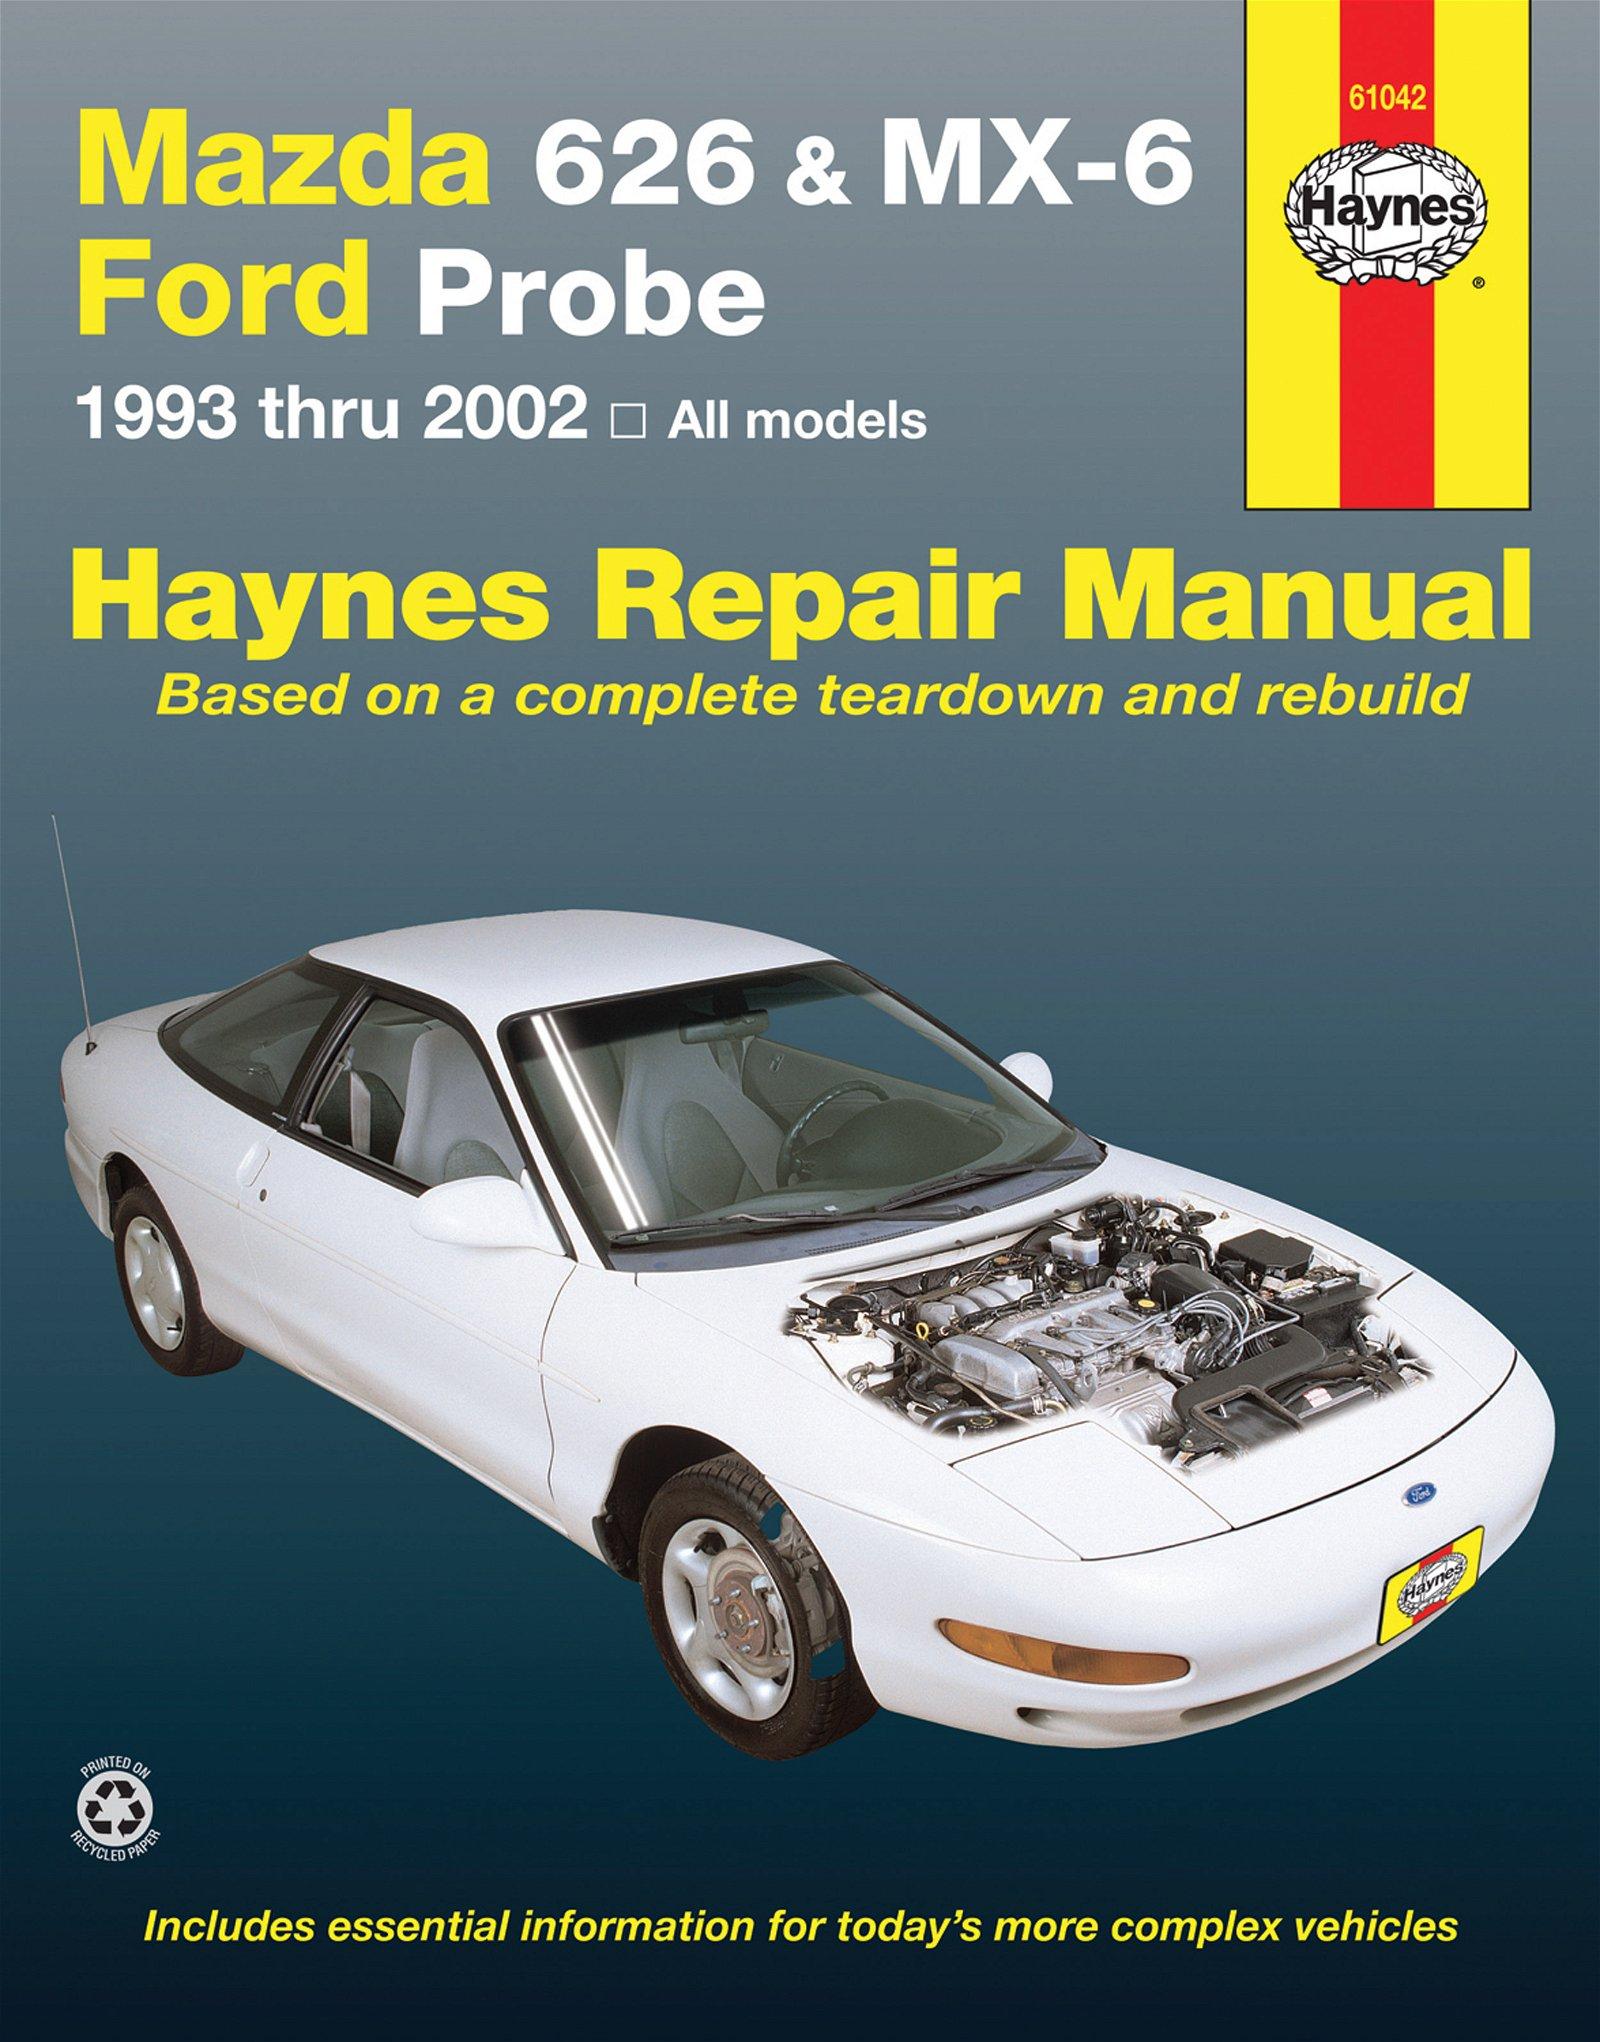 [Manuel US en Anglais] Mazda 626, MX-6 & Ford Probe  '93 -  '02